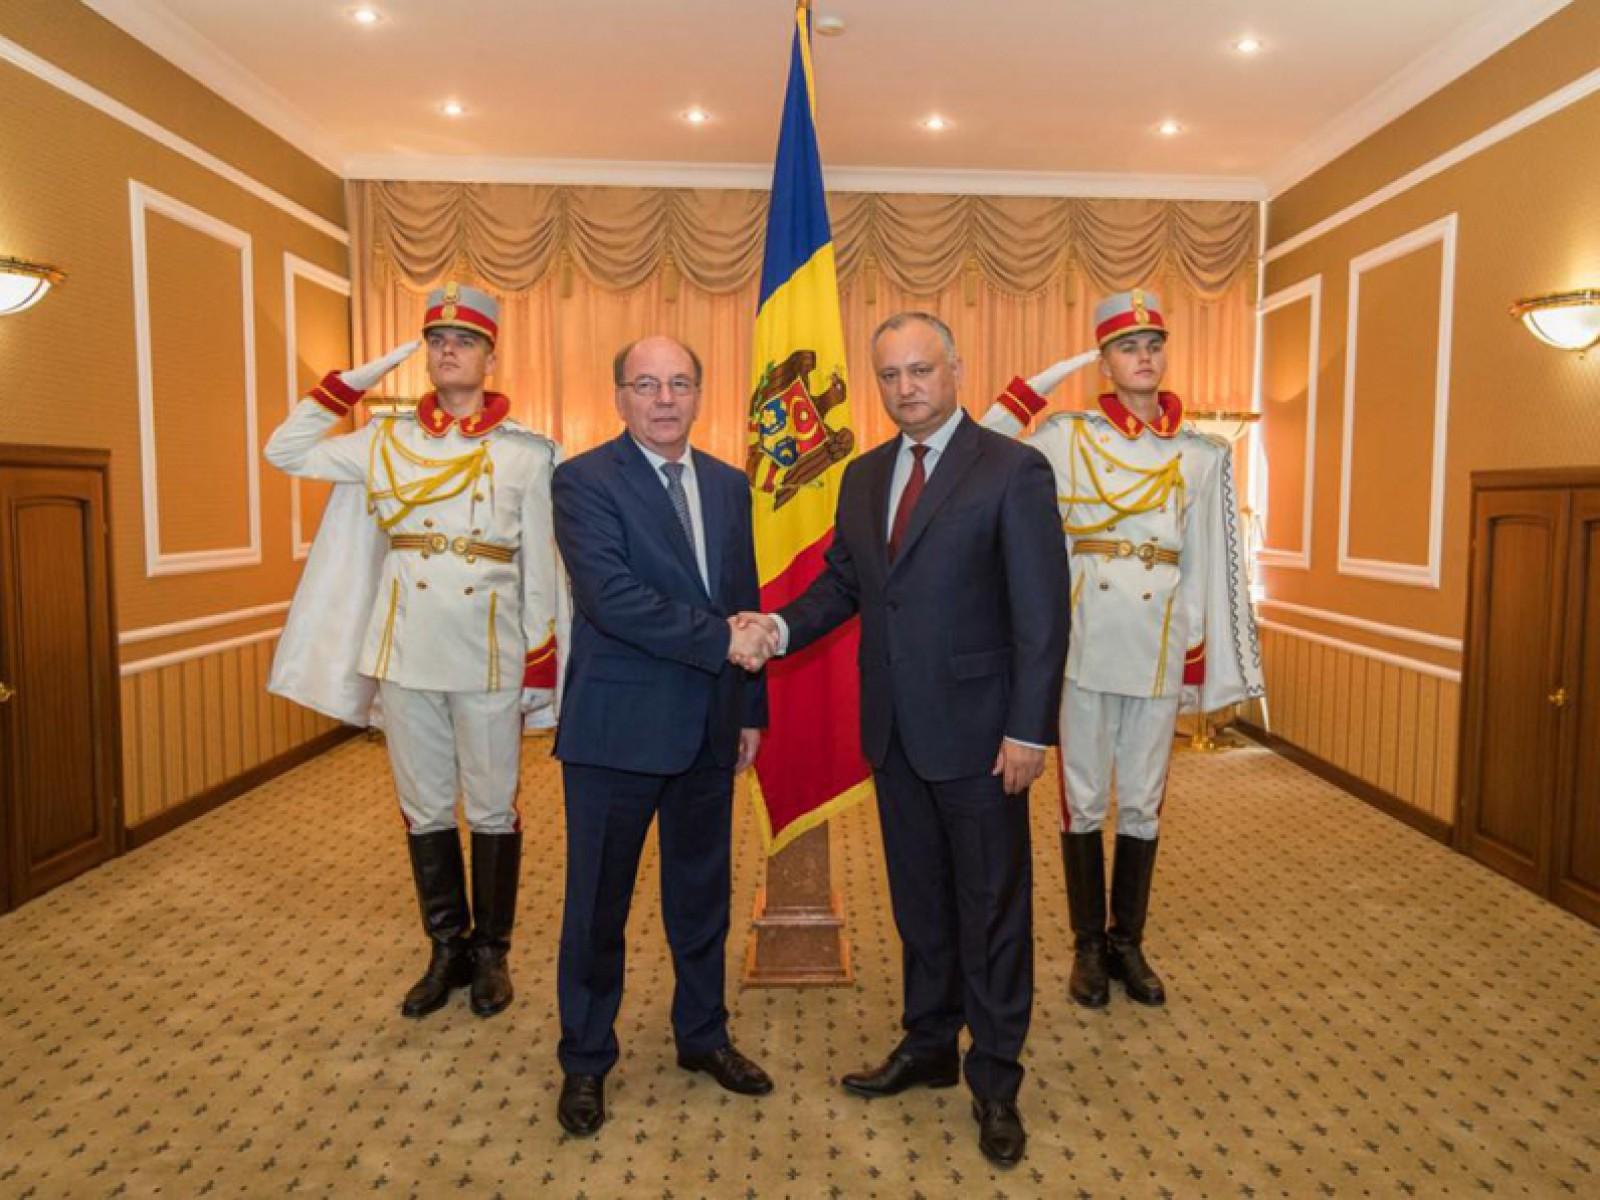 Rusia are un nou ambasador în Republica Moldova: Dodon a primit scrisorile de acreditare